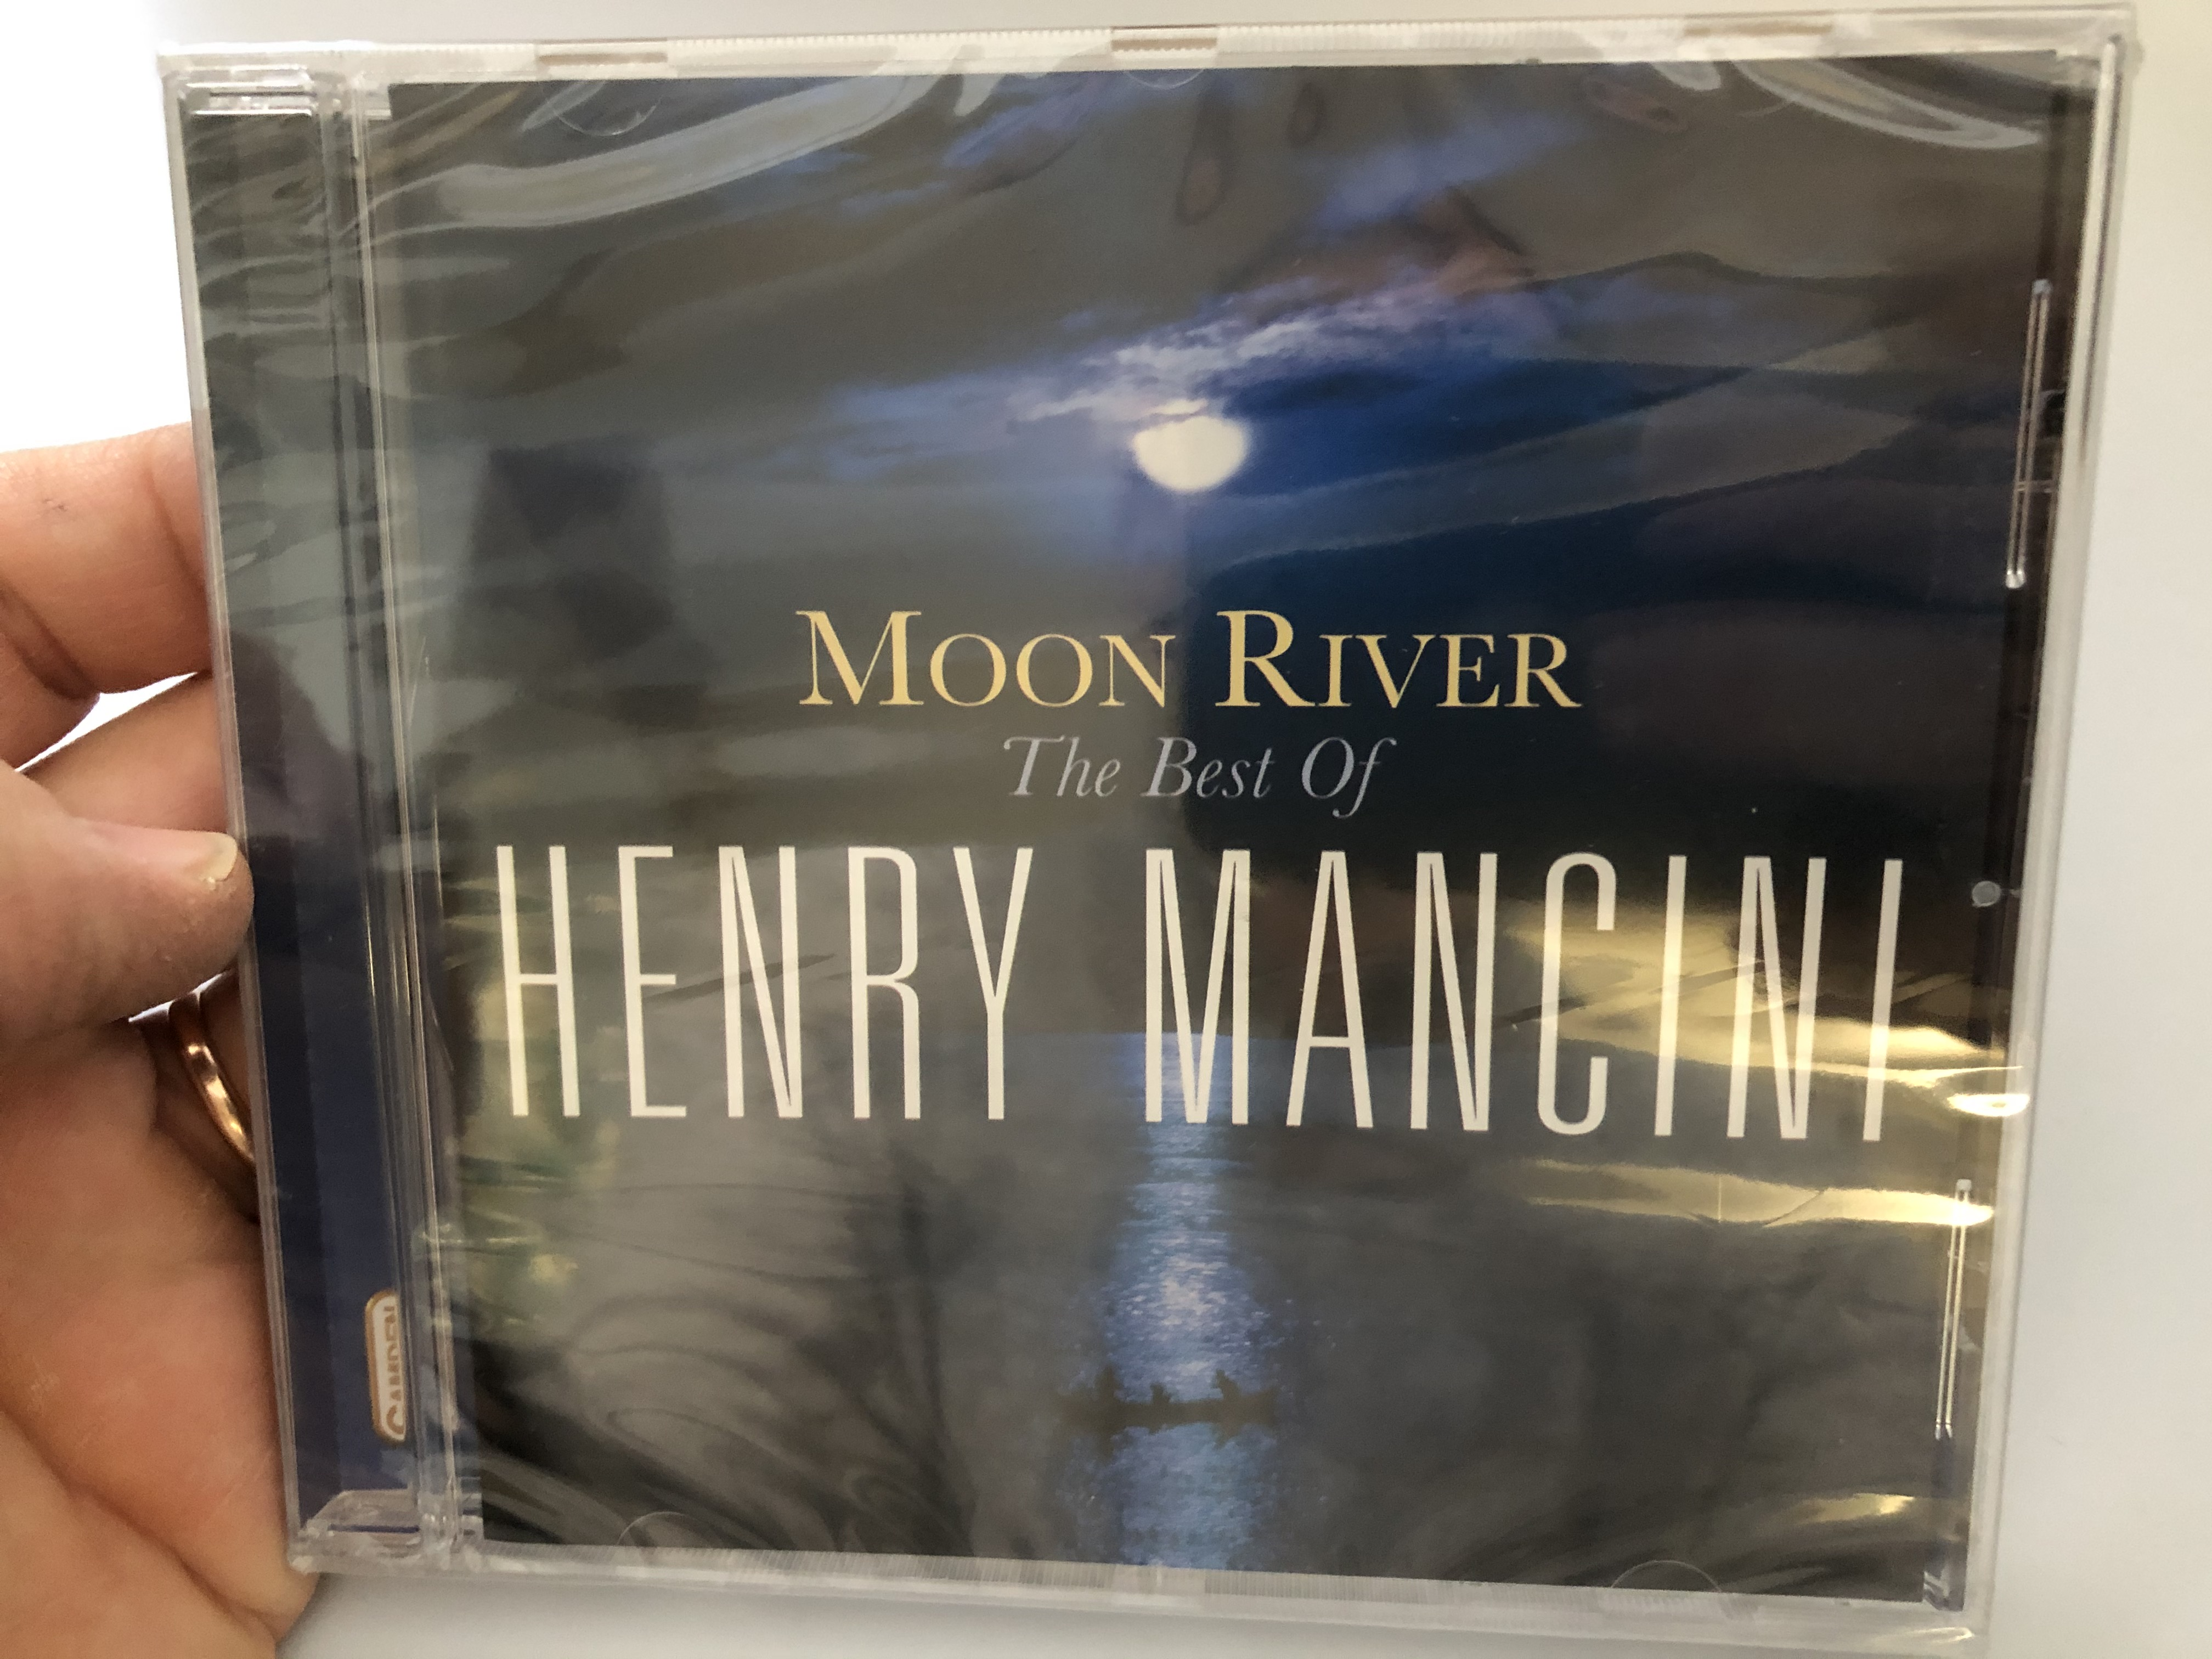 moon-river-the-best-of-henry-mancini-camden-audio-cd-2009-88697519812-1-.jpg